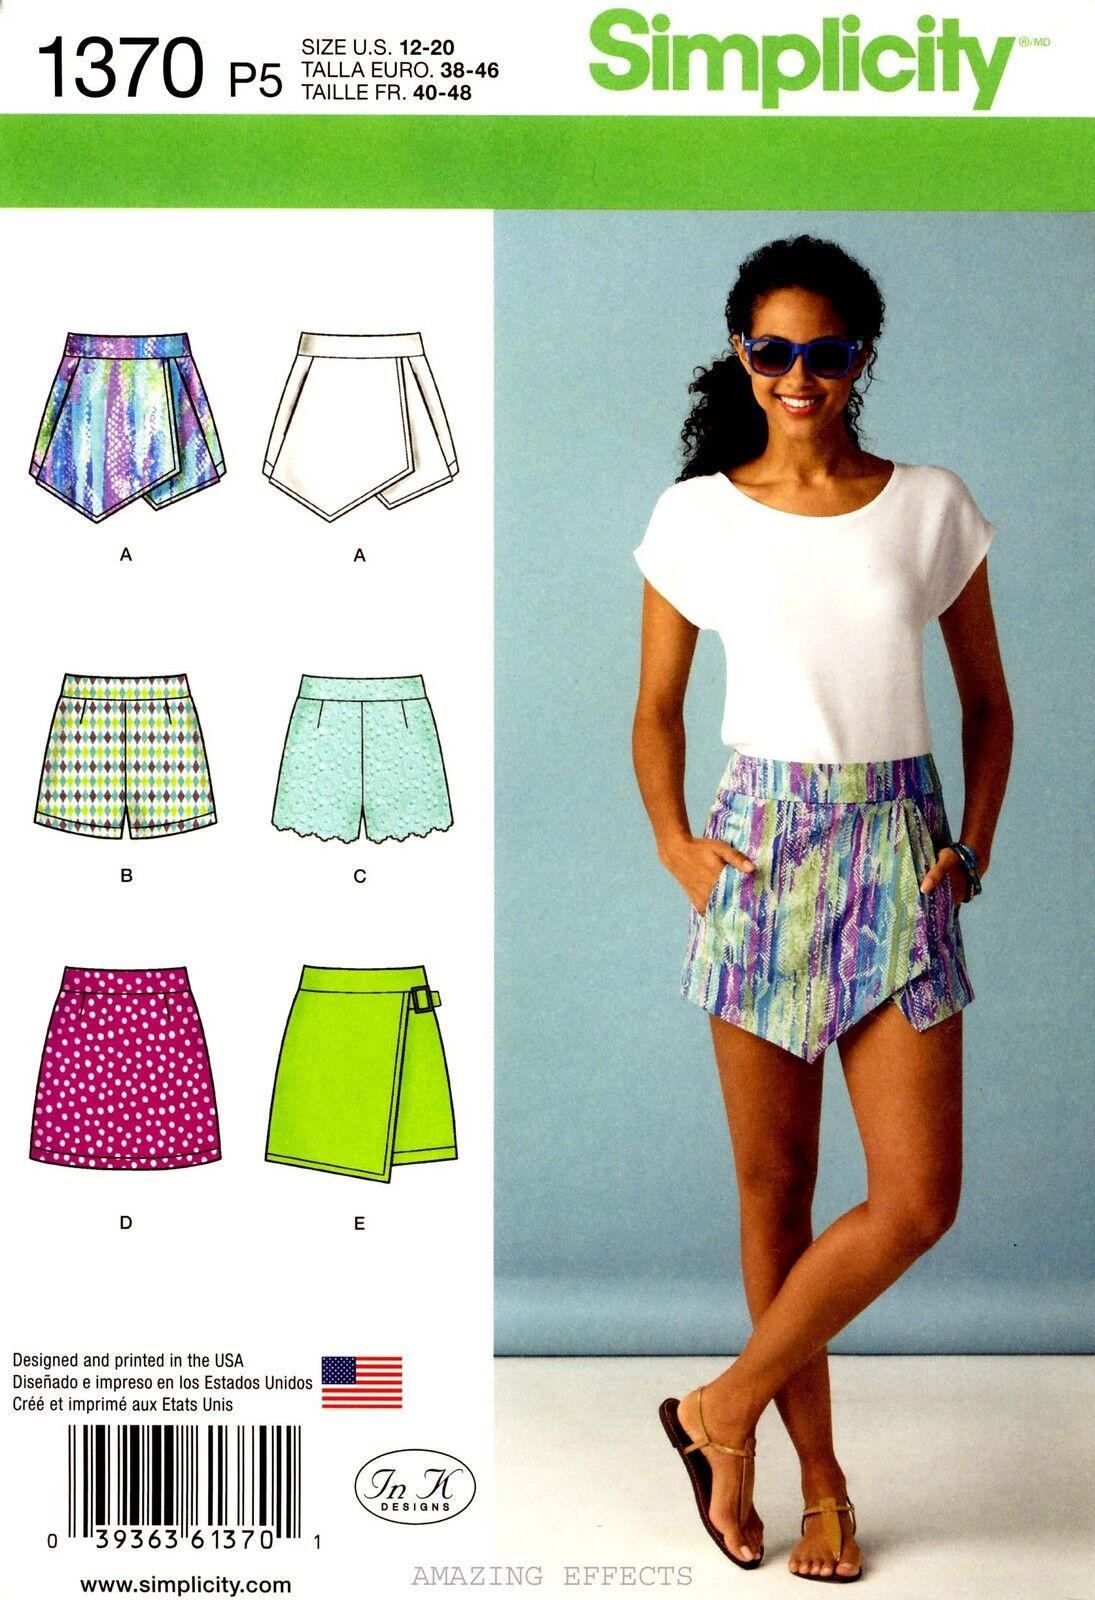 Simplicity Sewing Pattern 1370 Women's 12-20 Shorts Skort Skirts